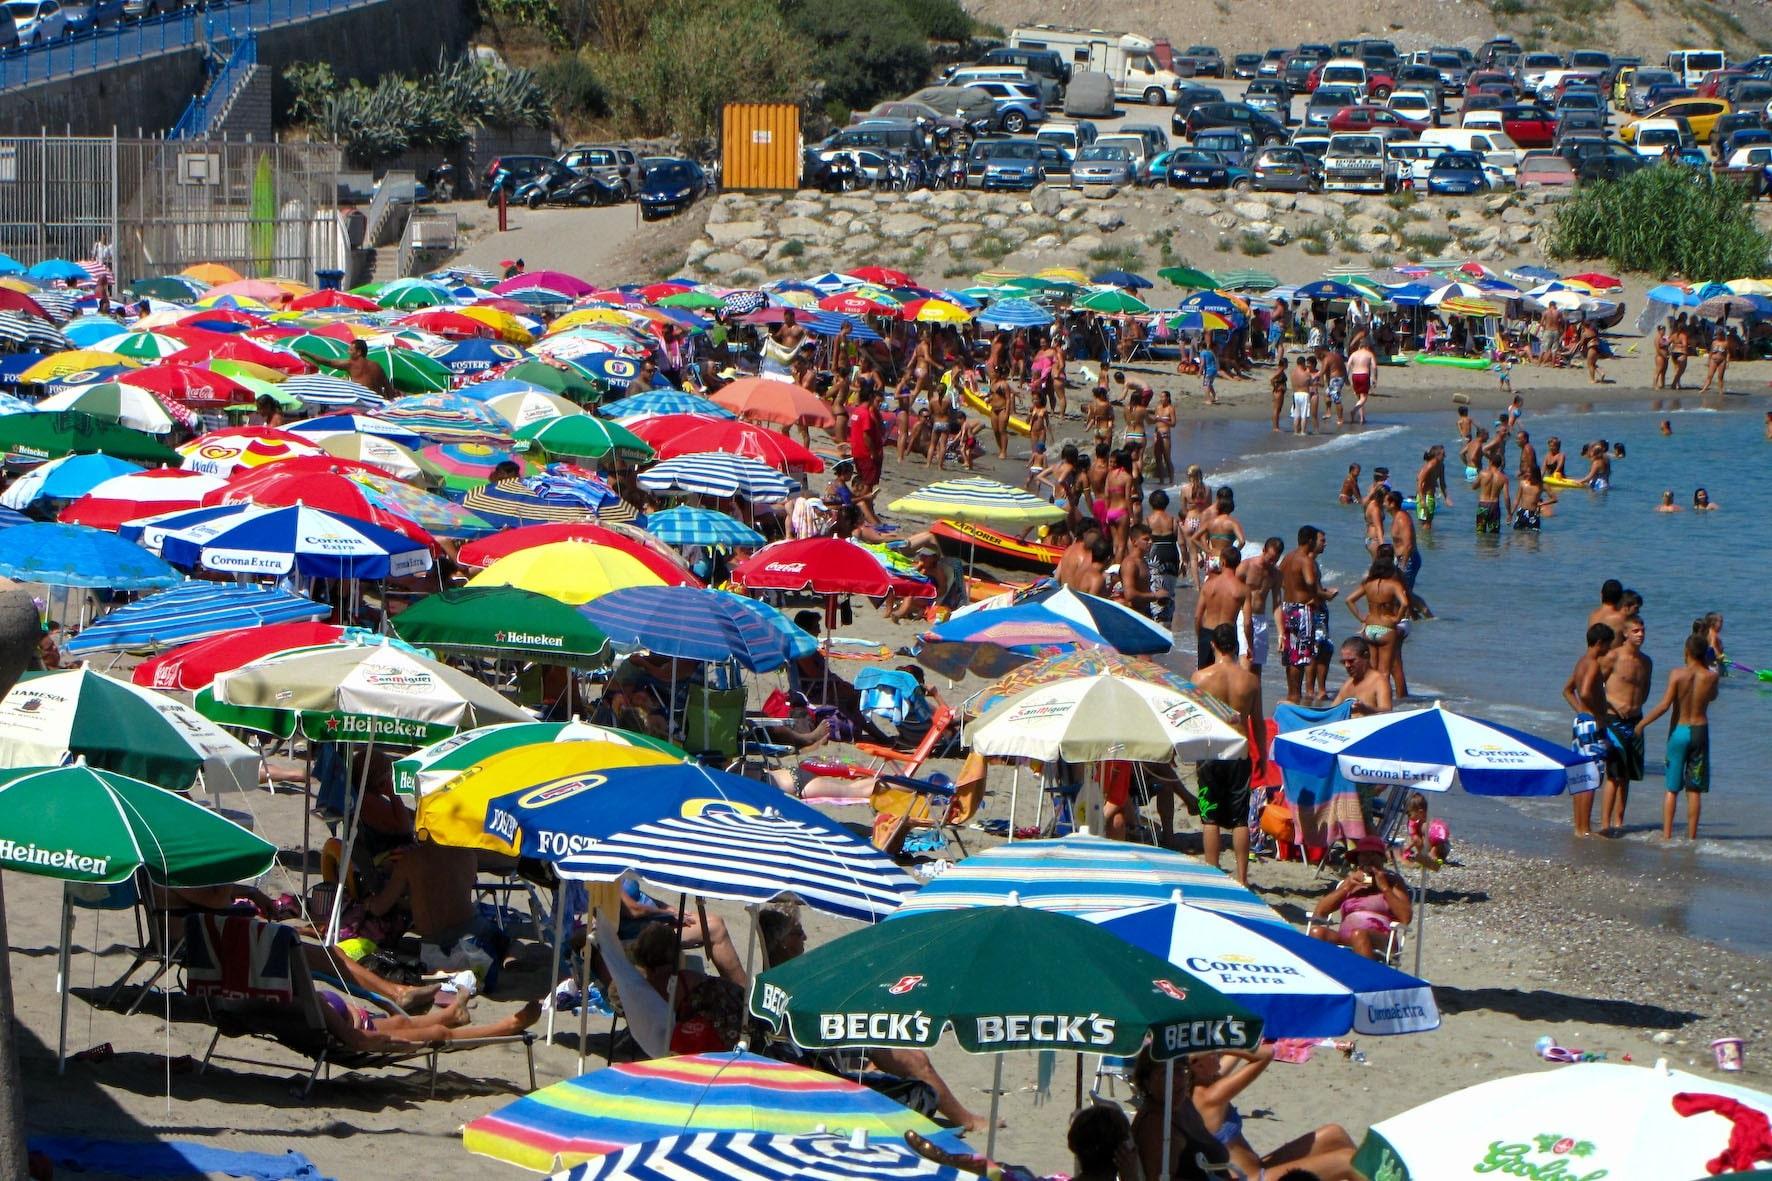 beaches-1_25762193678_o